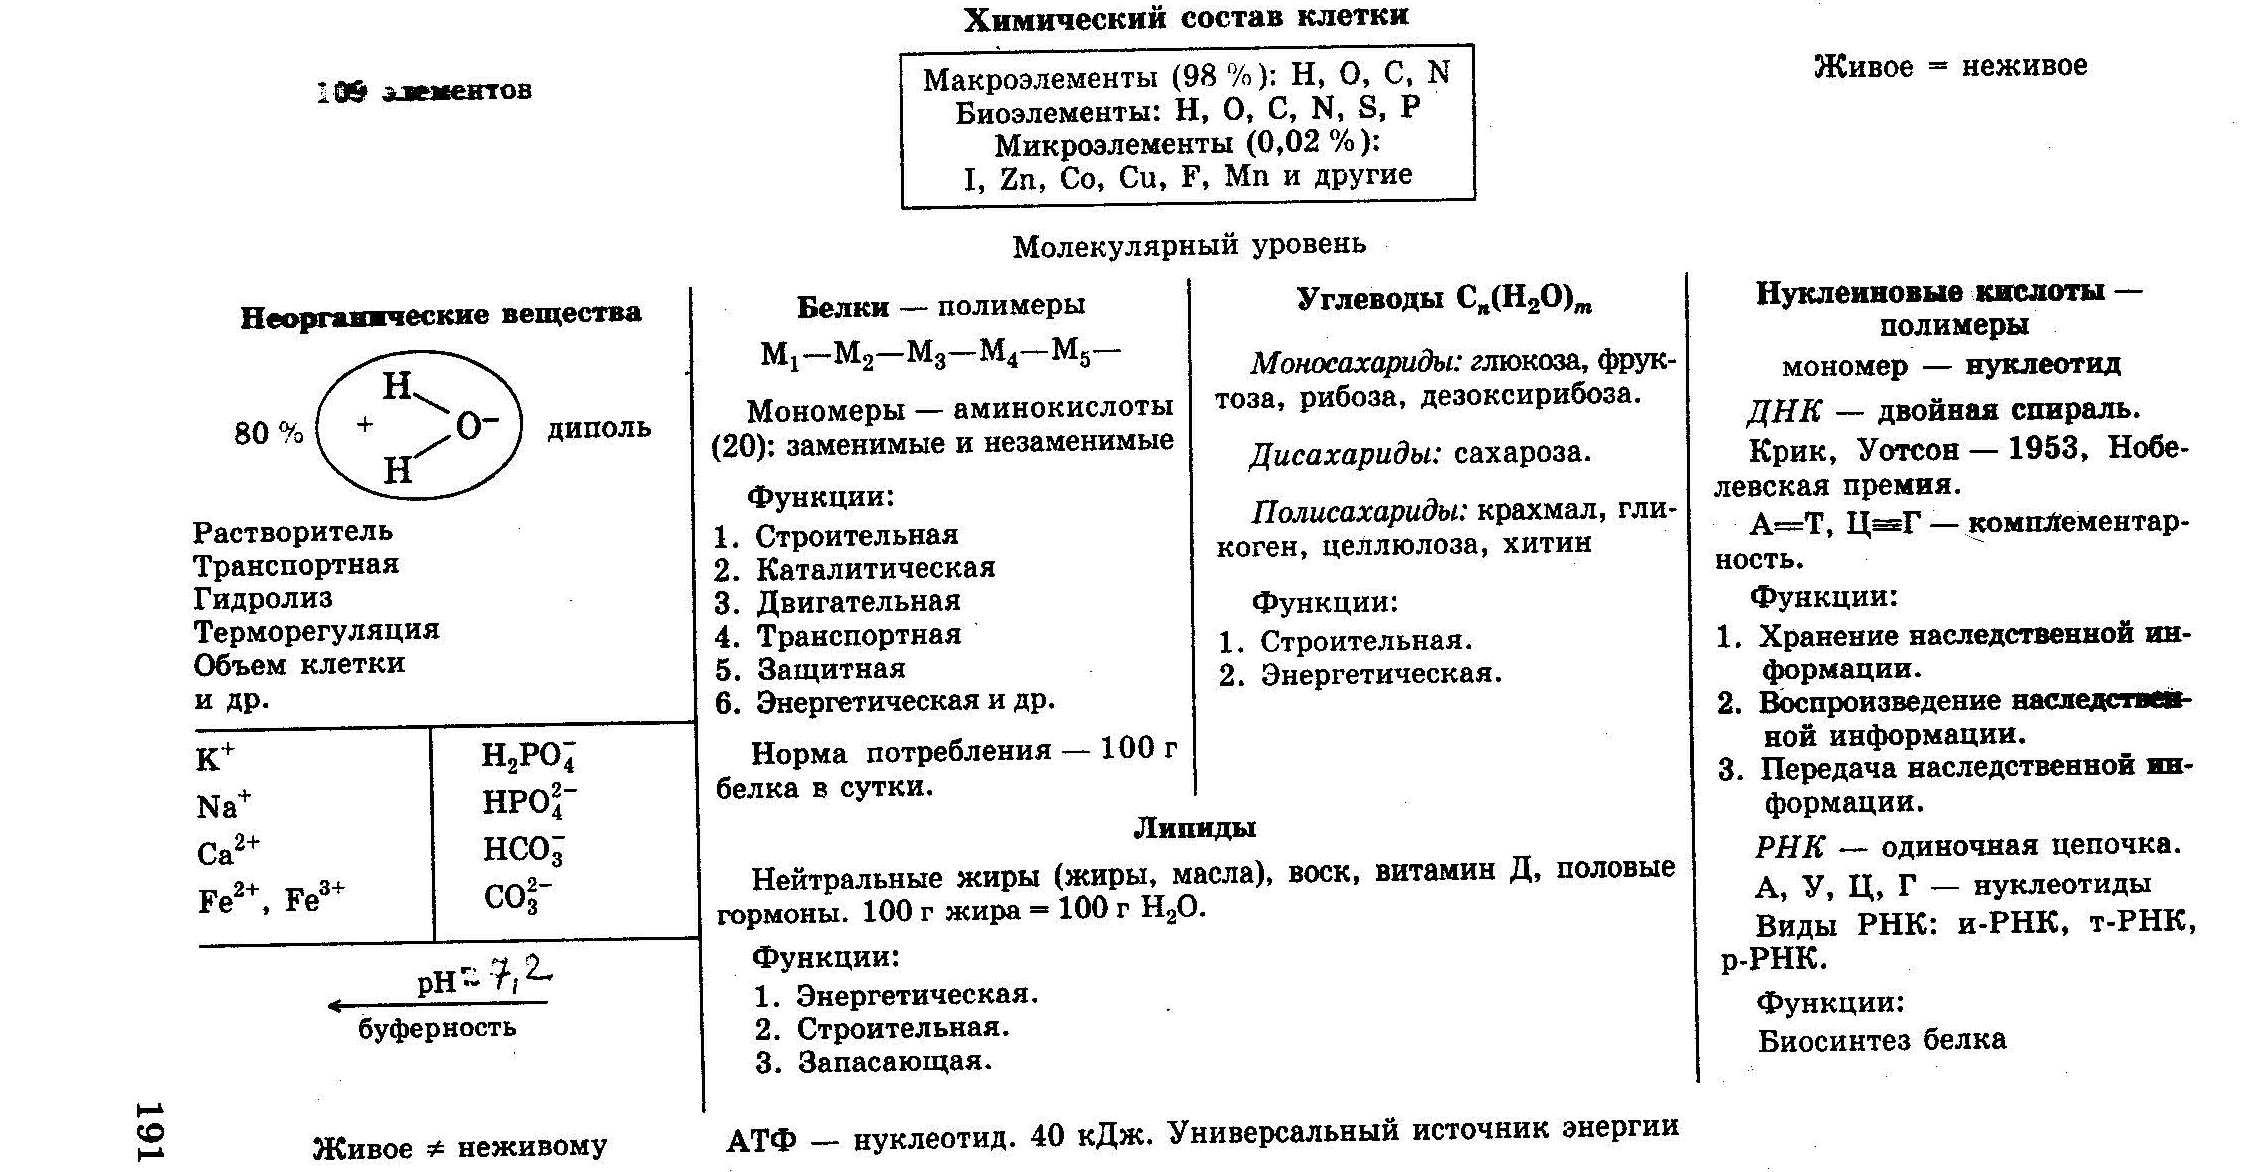 состав клеток растений таблица